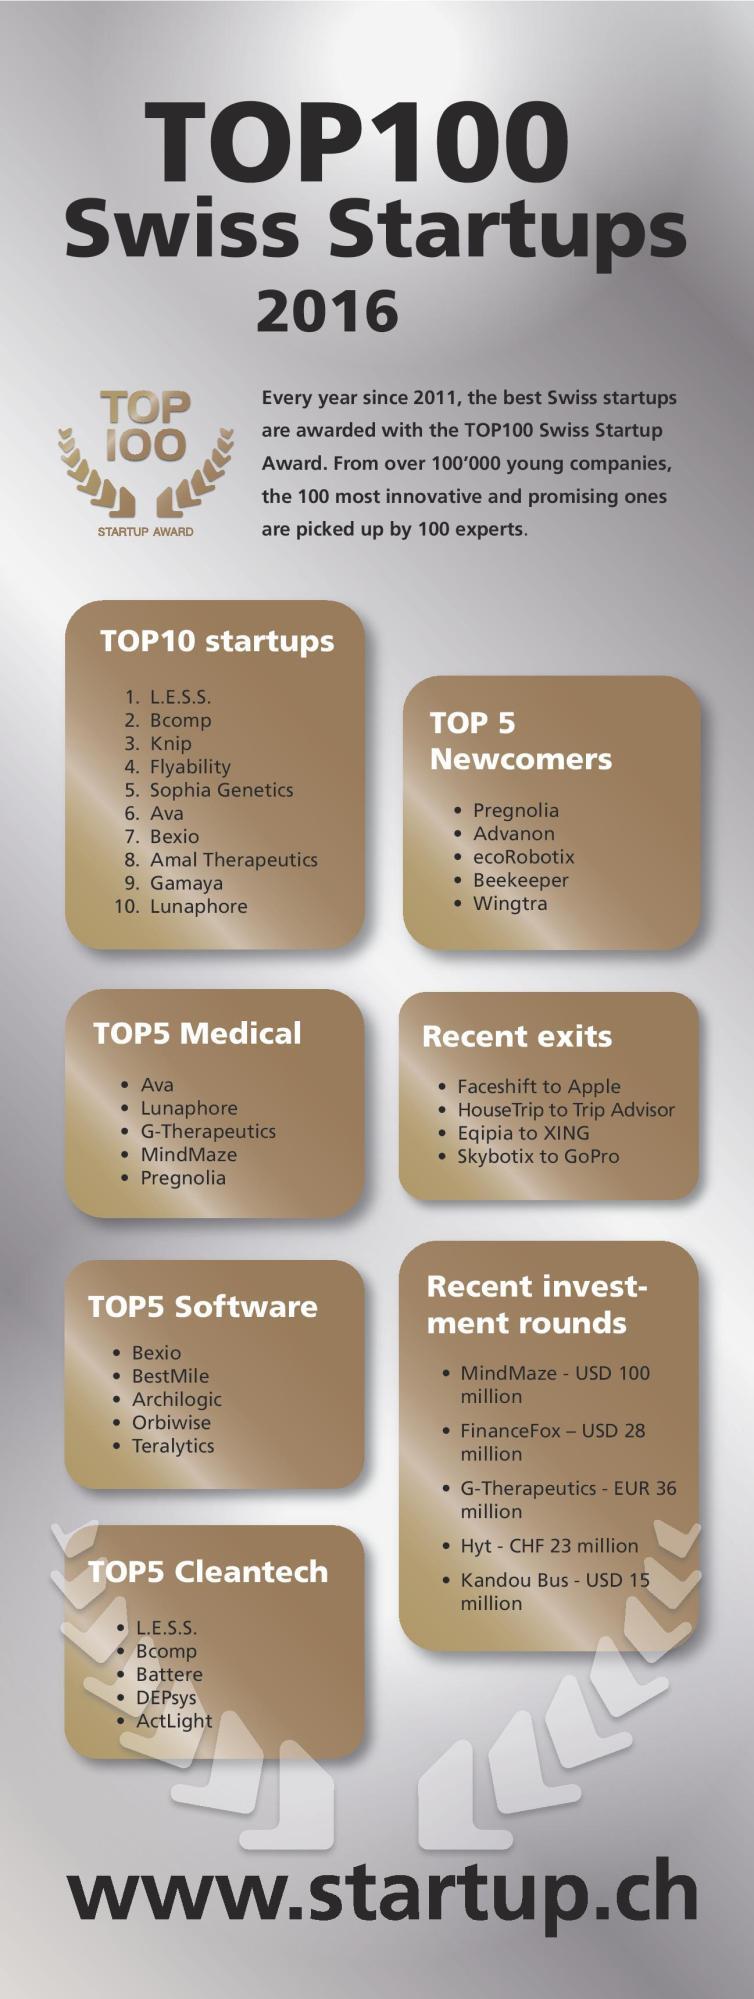 TOP 100 Swiss Startups 2016